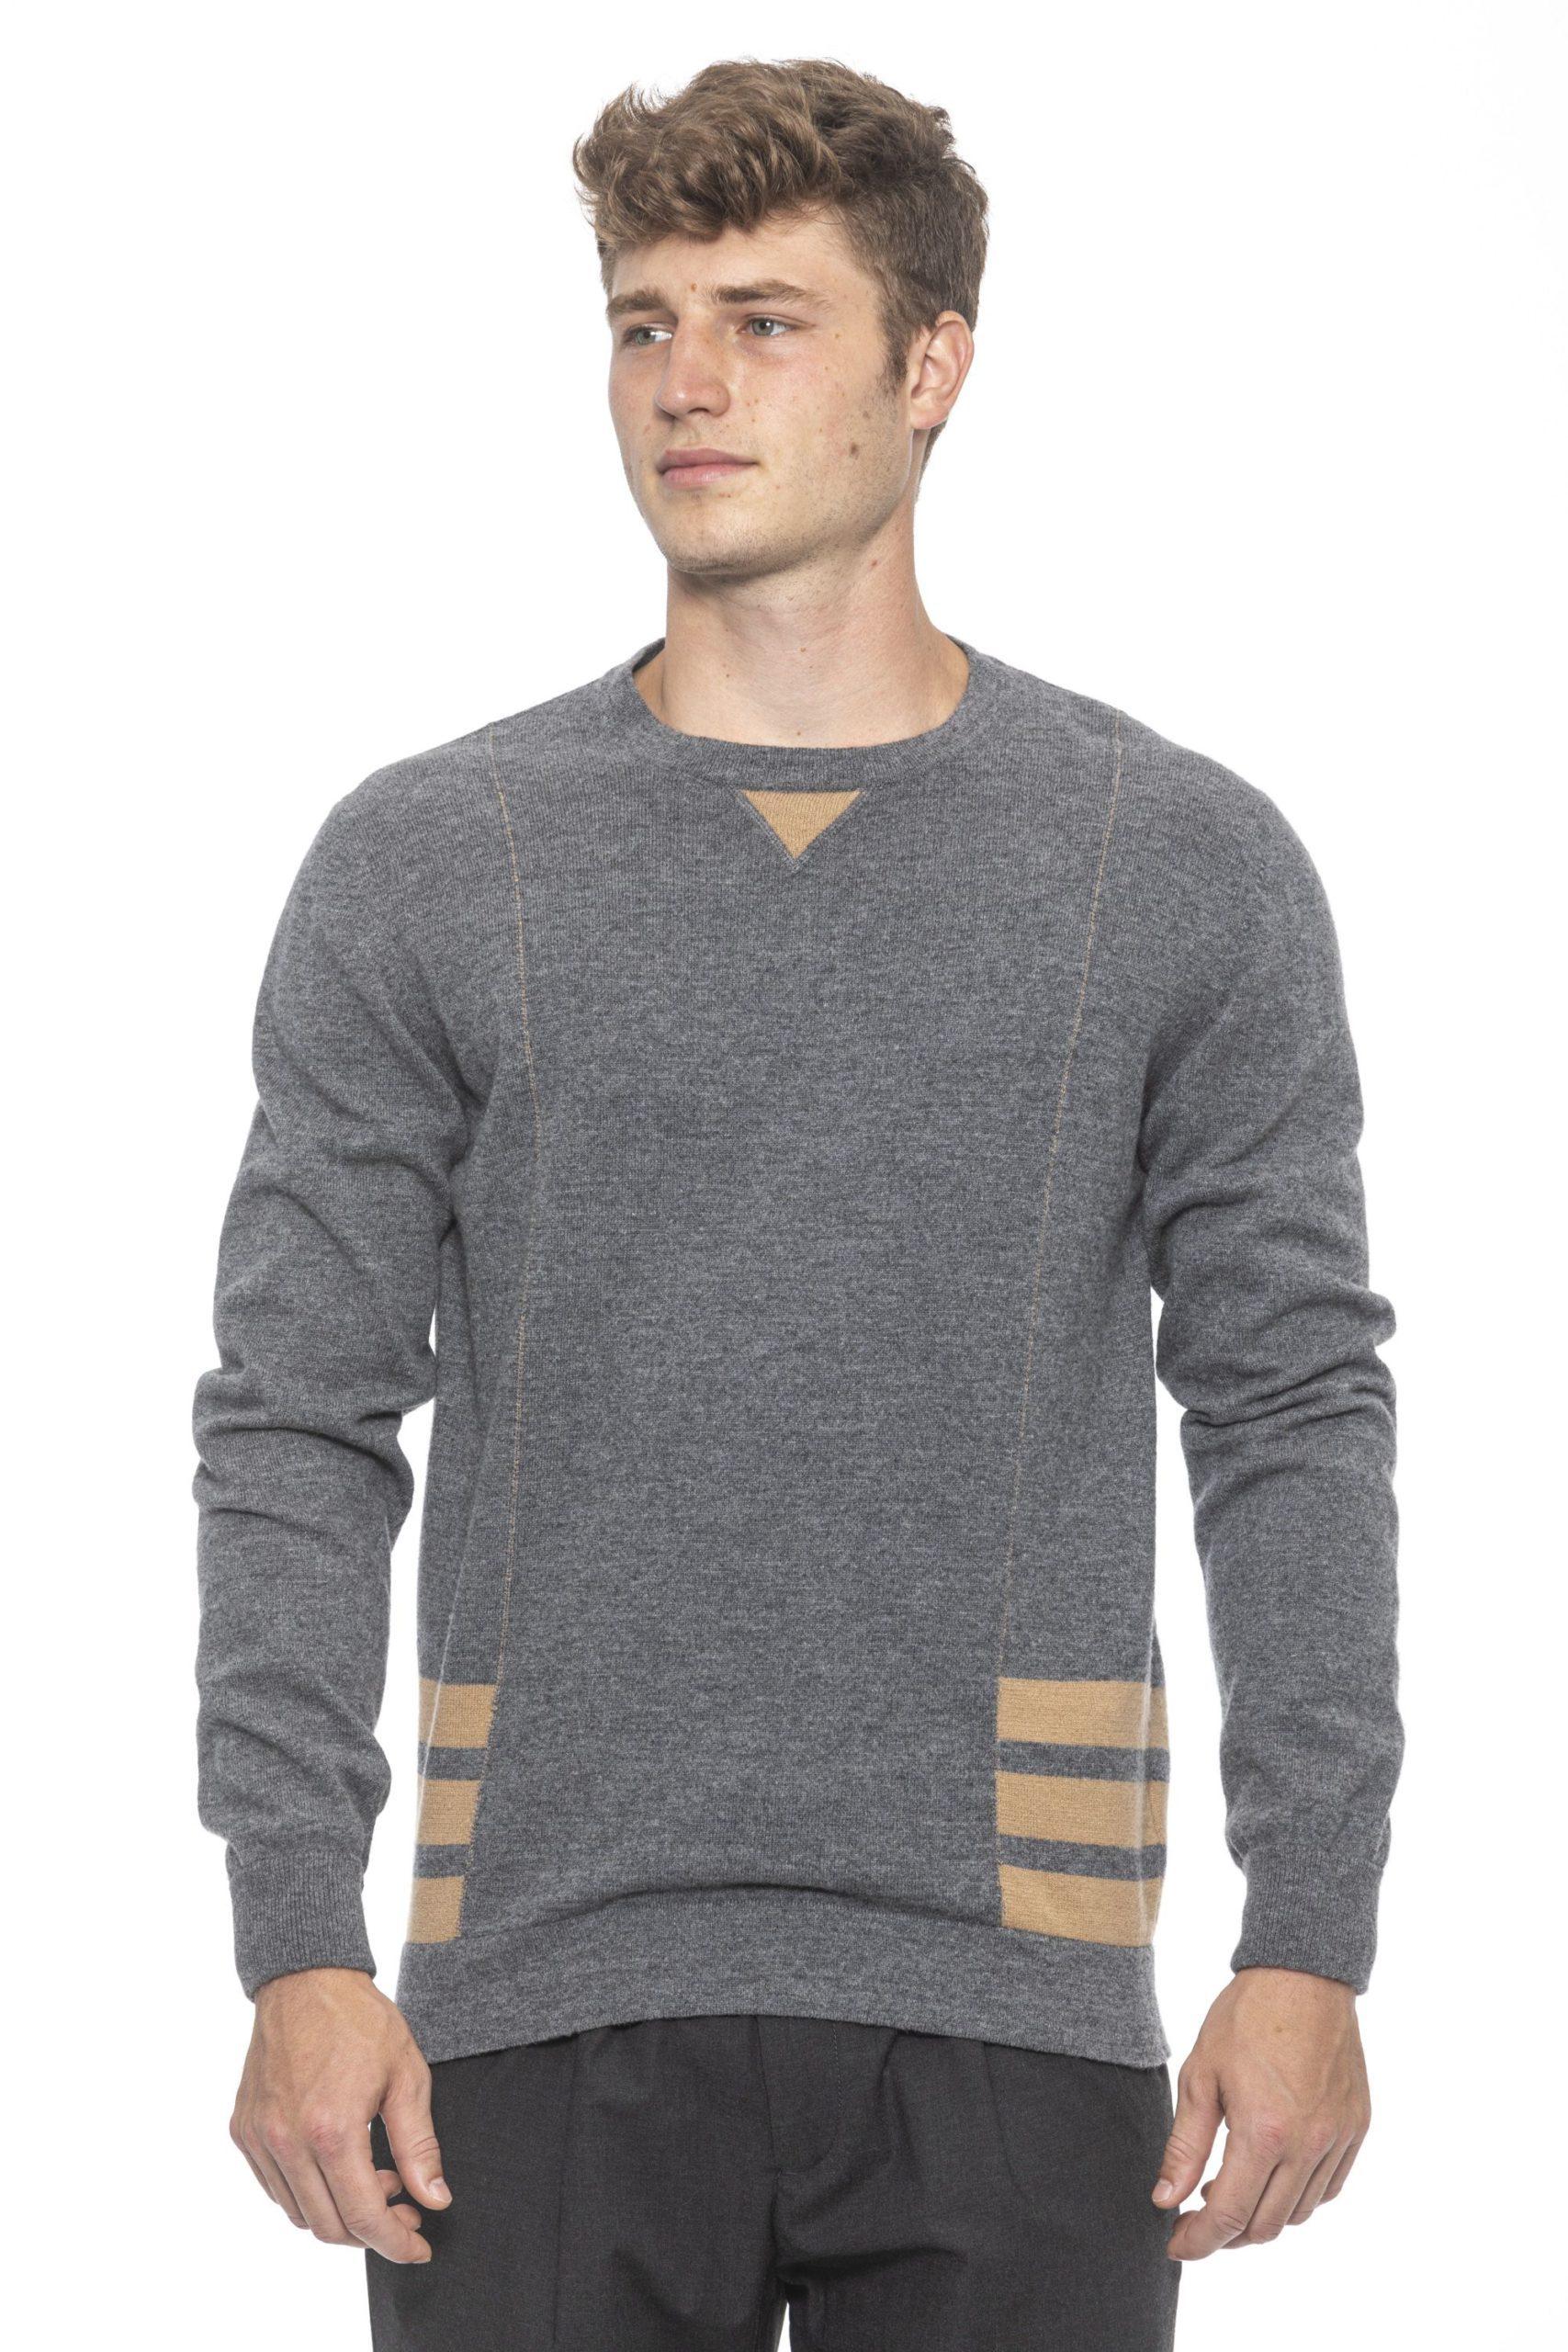 Alpha Studio Men's Grigio Sweater Gray AL1191968 - IT50 | L